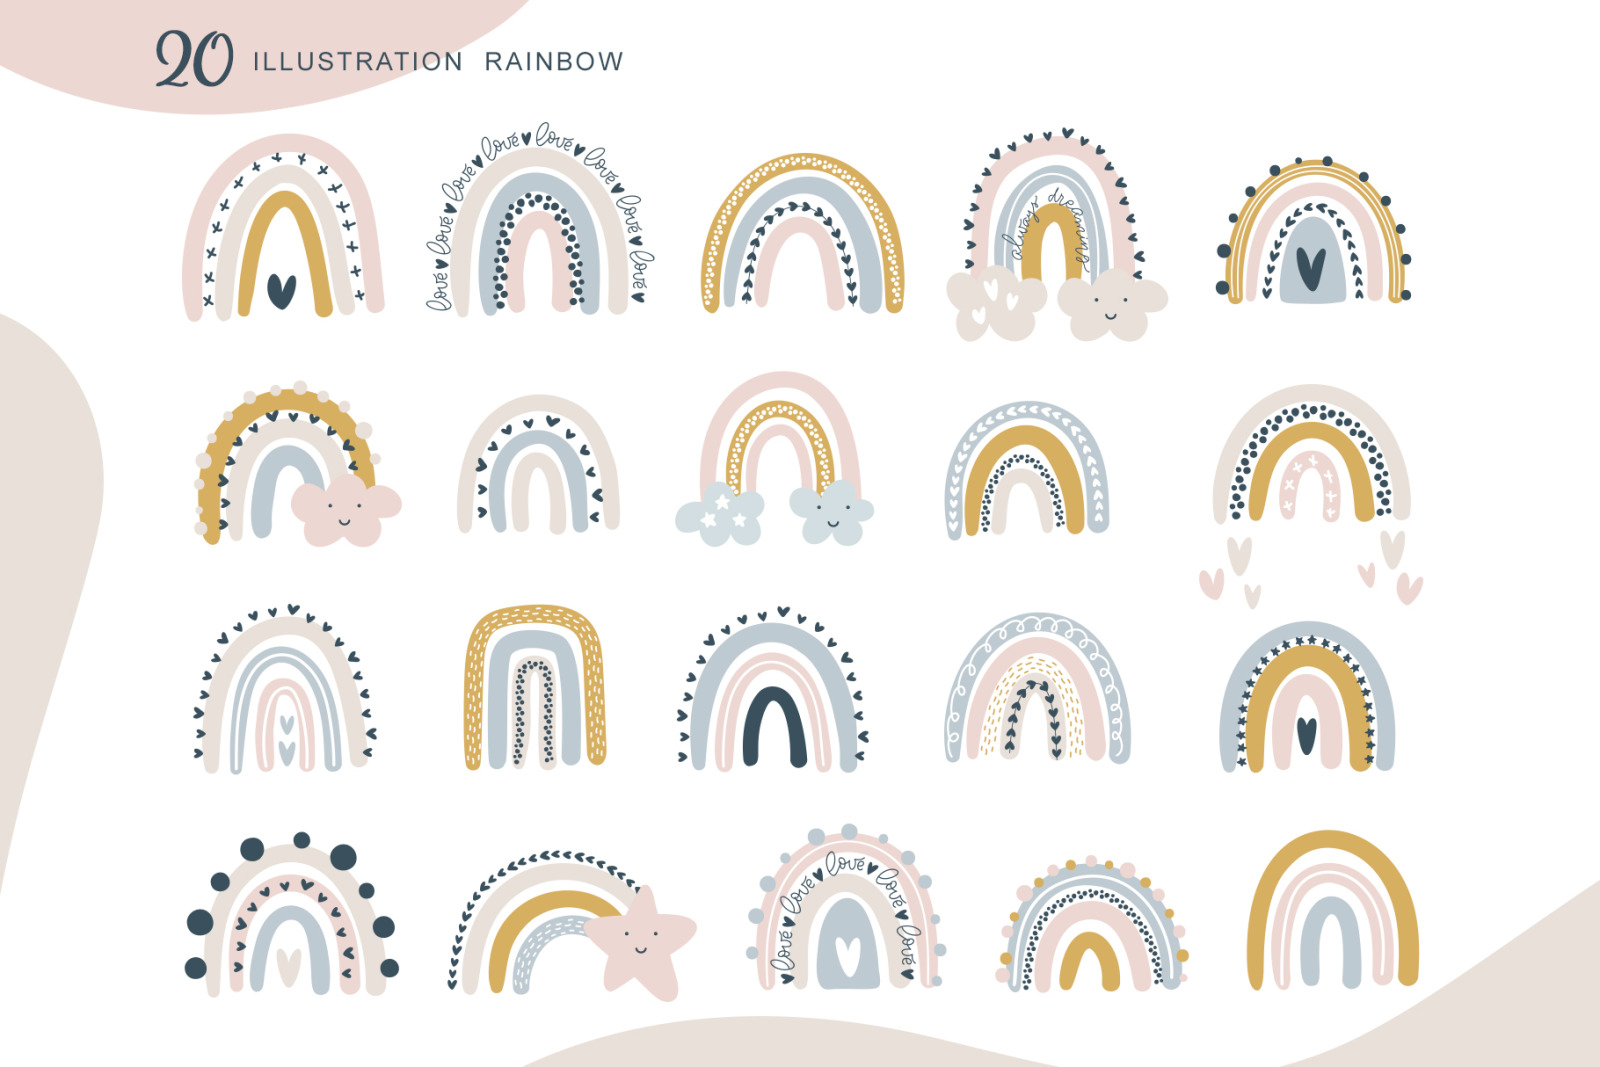 Rainbow scandinavian SVG